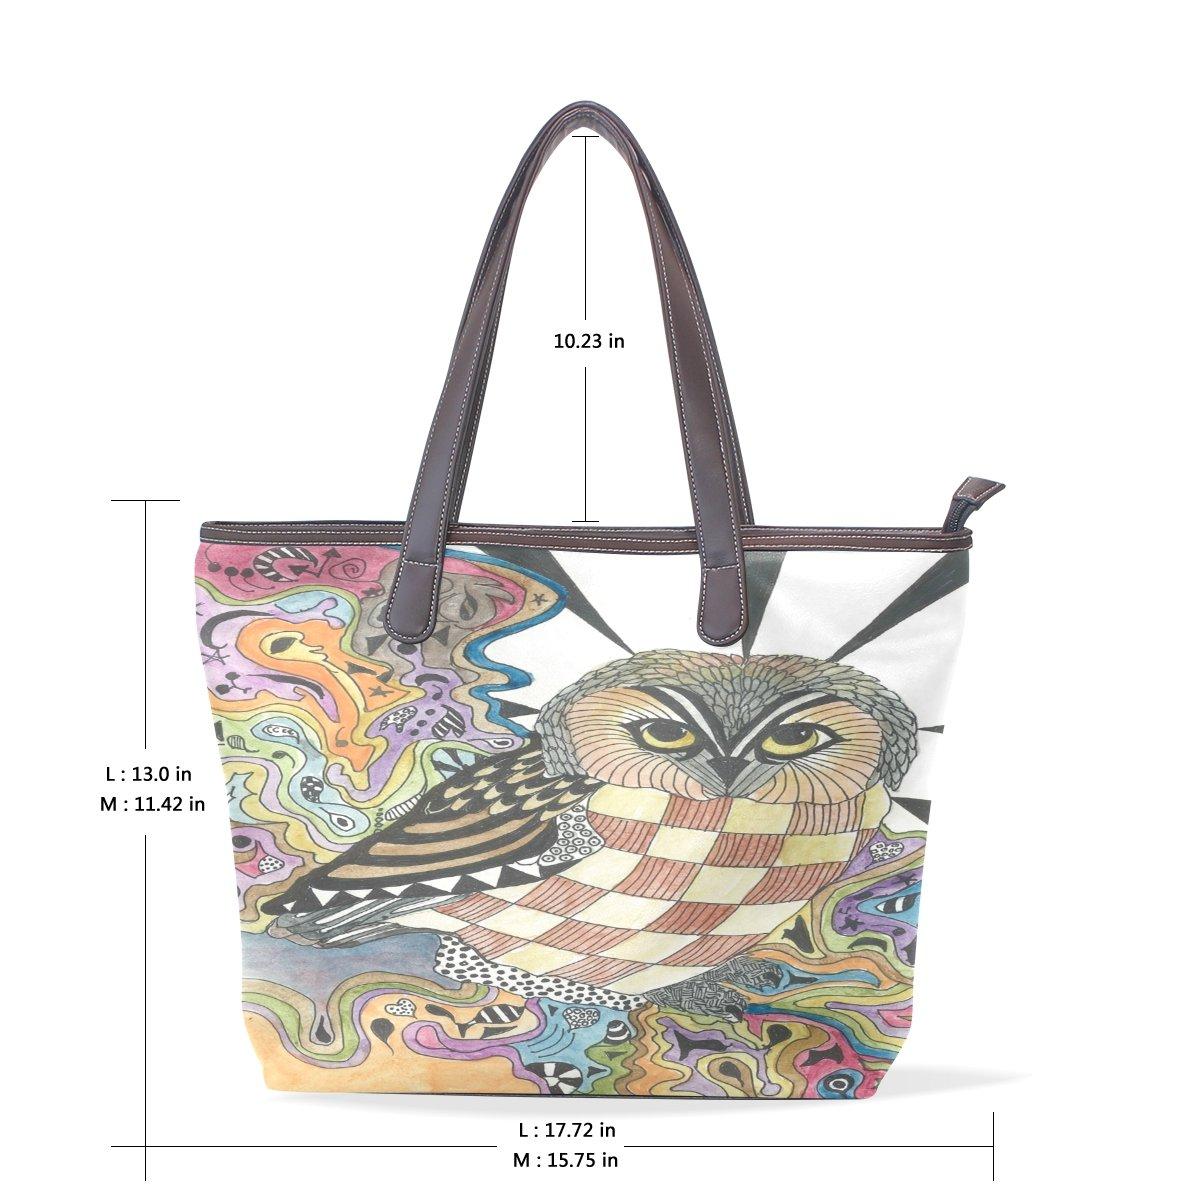 Ye Store Watercolor Owl Lady PU Leather Handbag Tote Bag Shoulder Bag Shopping Bag